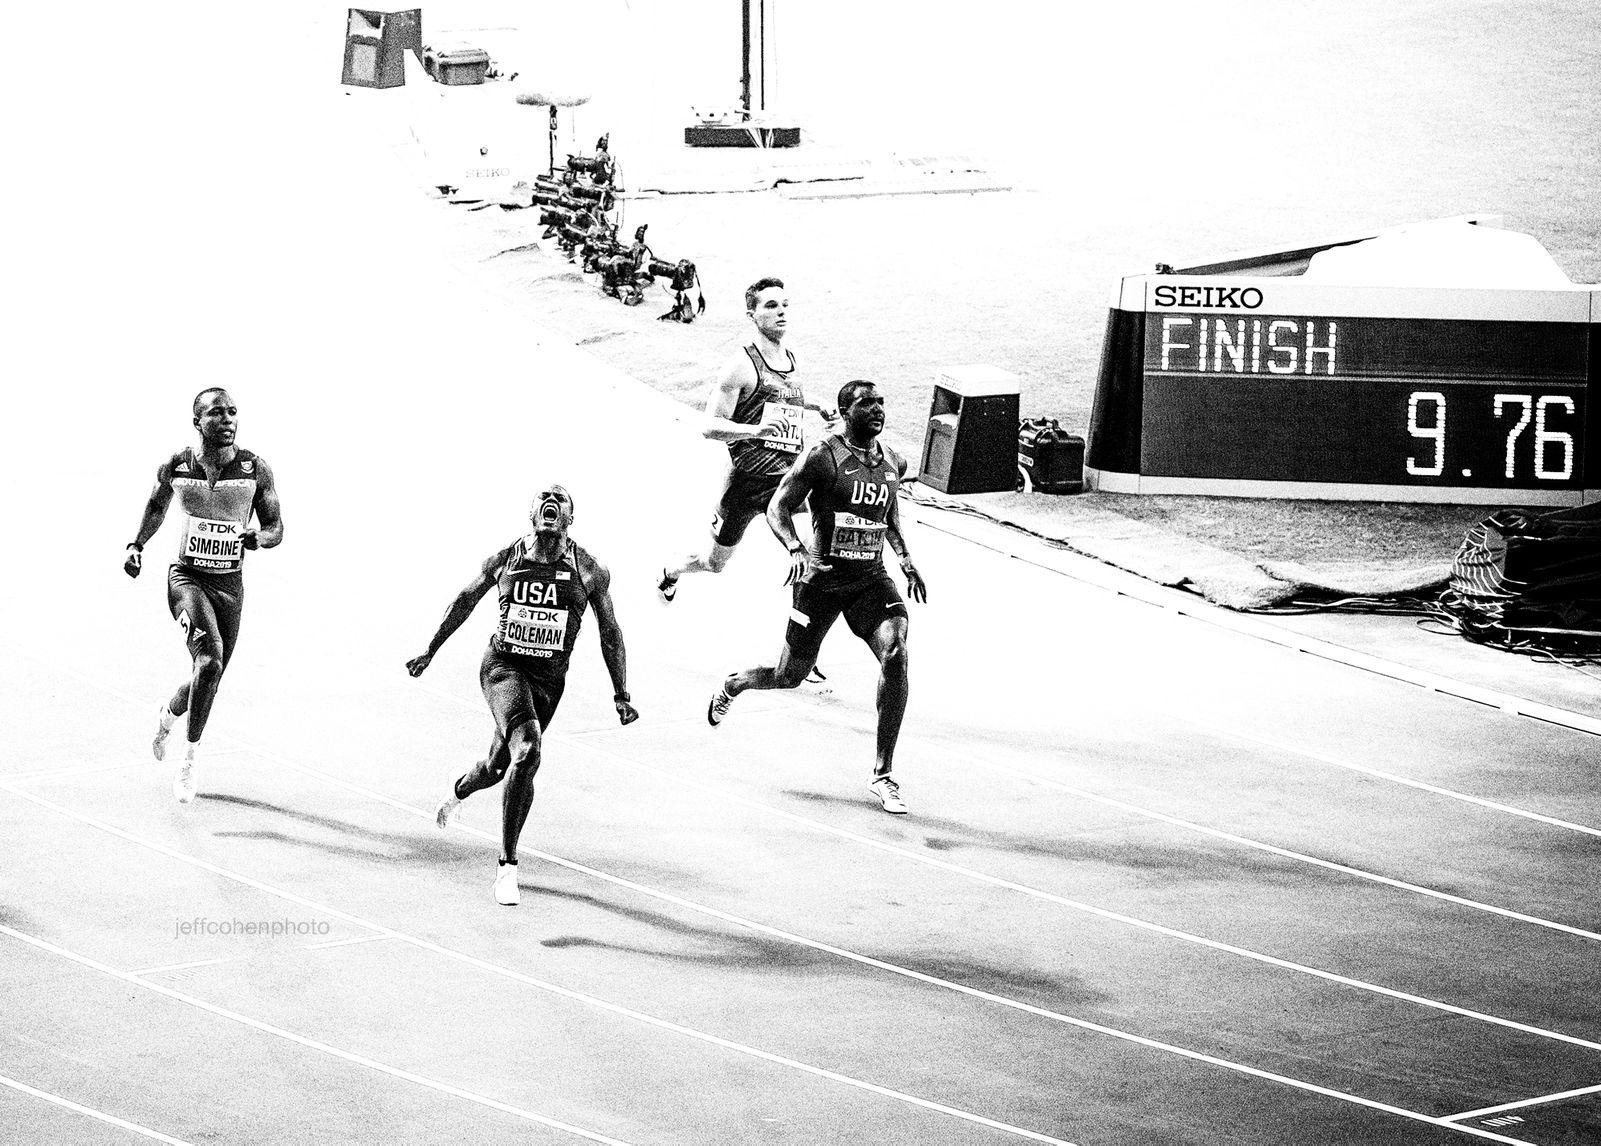 coleman-100m-2019-DOHA-WC-day-2--2863---jeff-cohen-photo--web.jpg